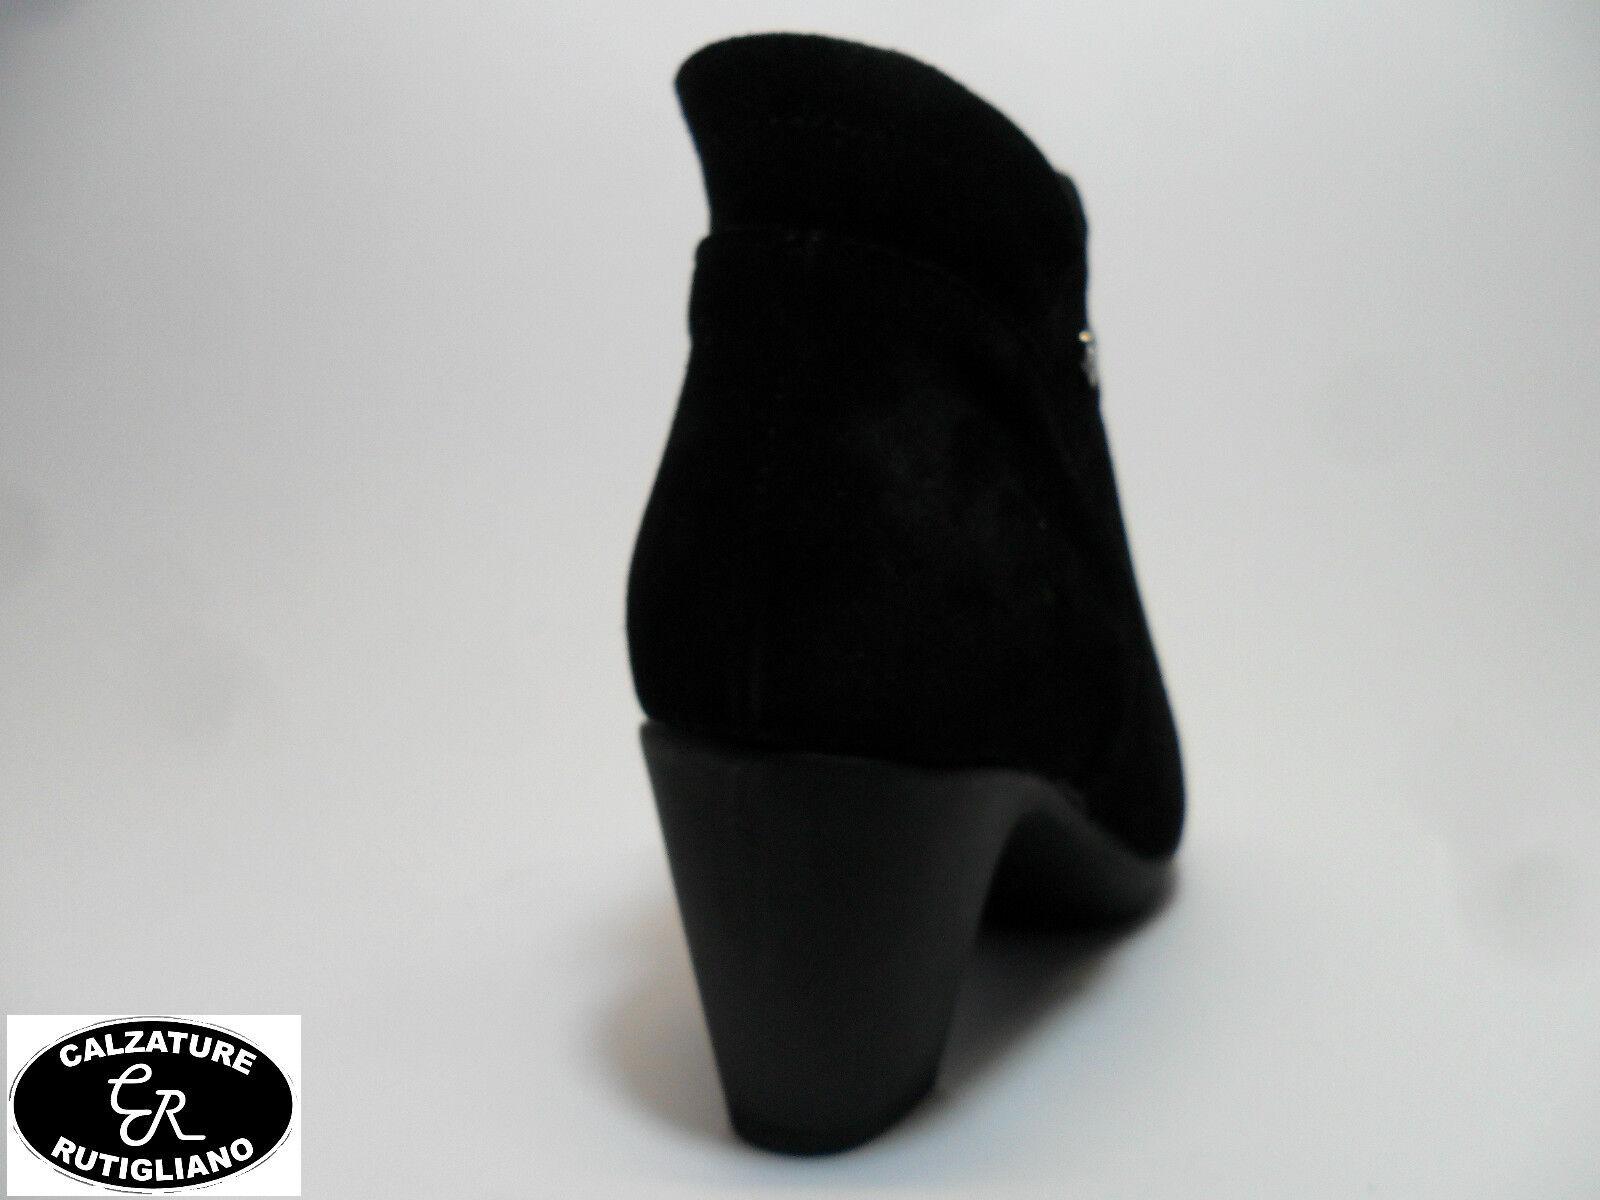 SUSIMODA art.8554/99 Schuhe Damens STIVALETTI CAMOSCIO NERO CERNIERA COMODA LINEA COMODA CERNIERA 767854